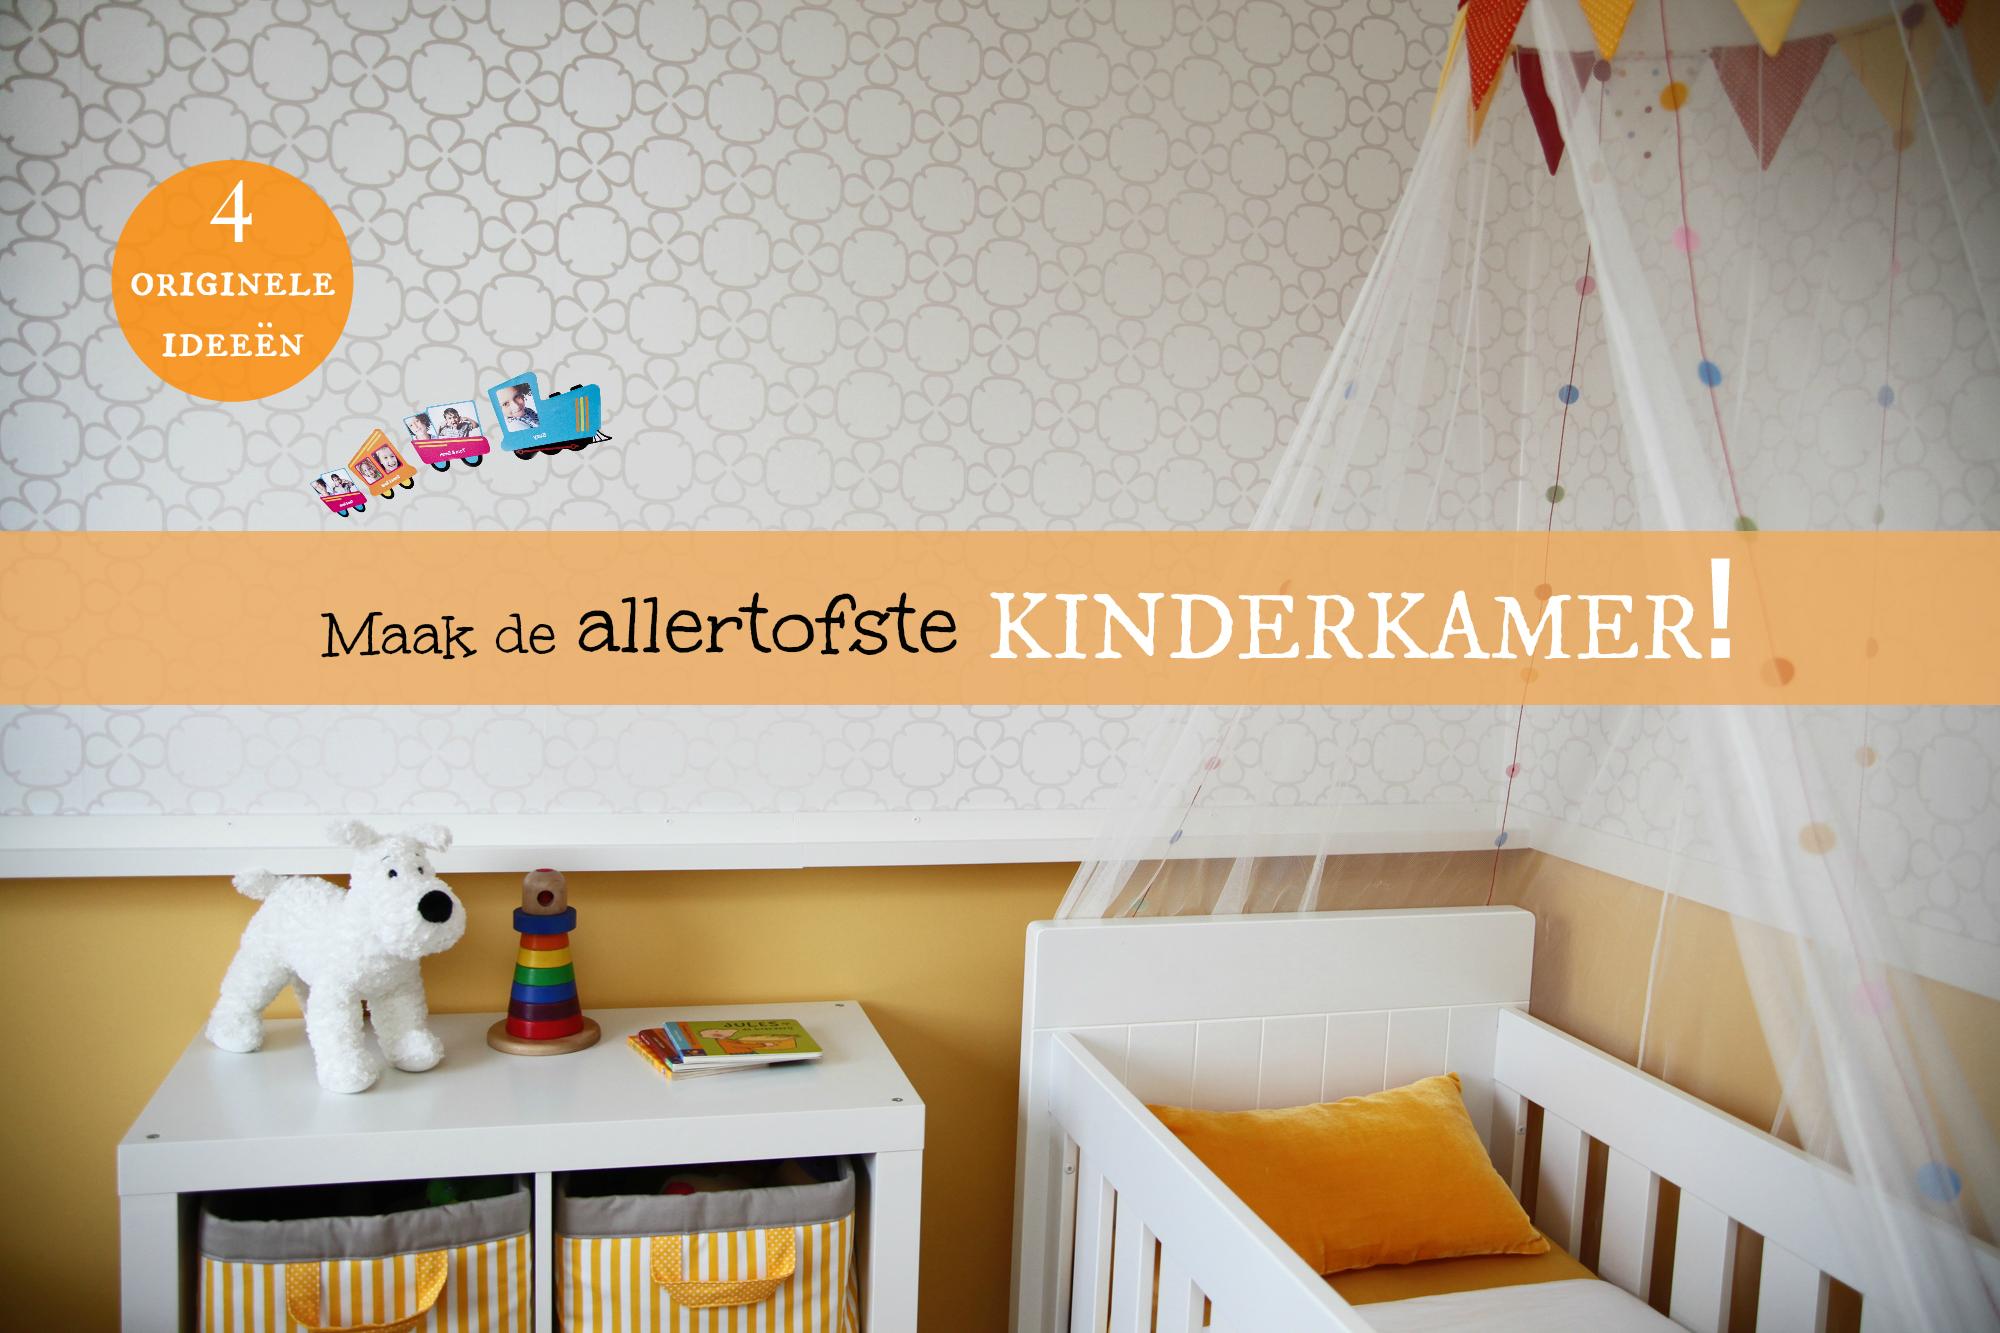 Babykamer Ideeen Muur : Wanddecoratie kinderkamer: 4 leuke en originele ideeën